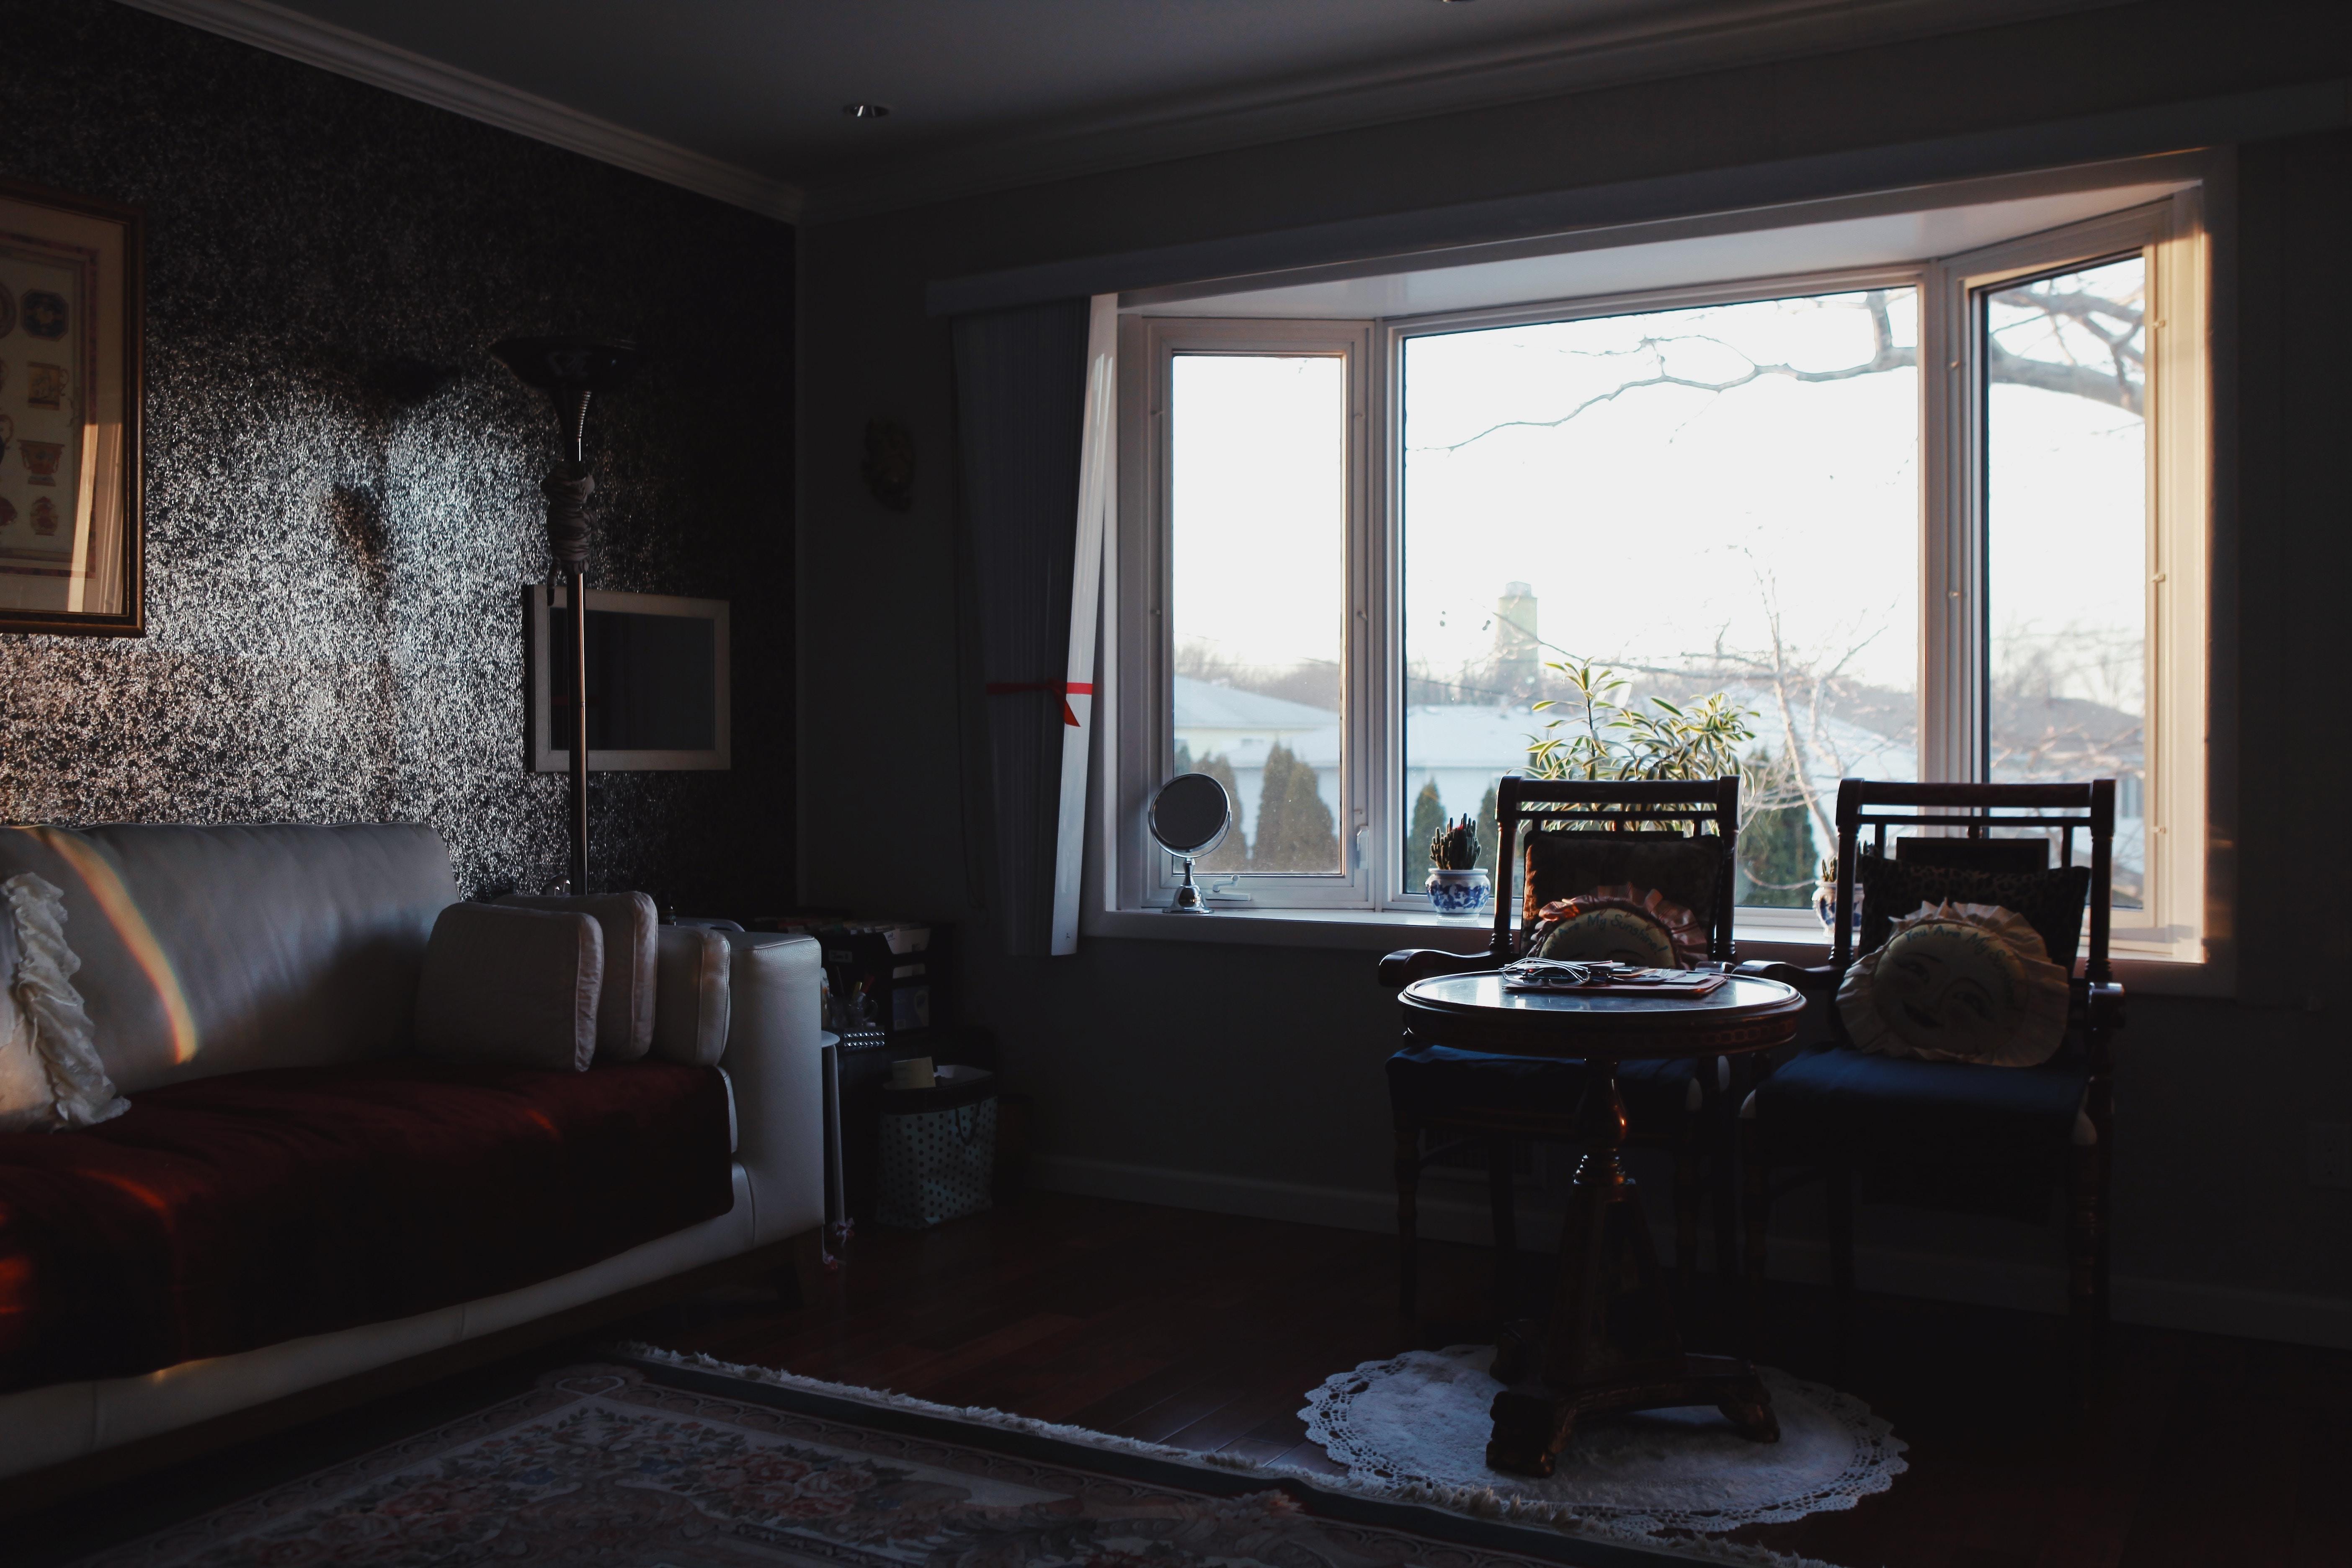 two chairs beside window